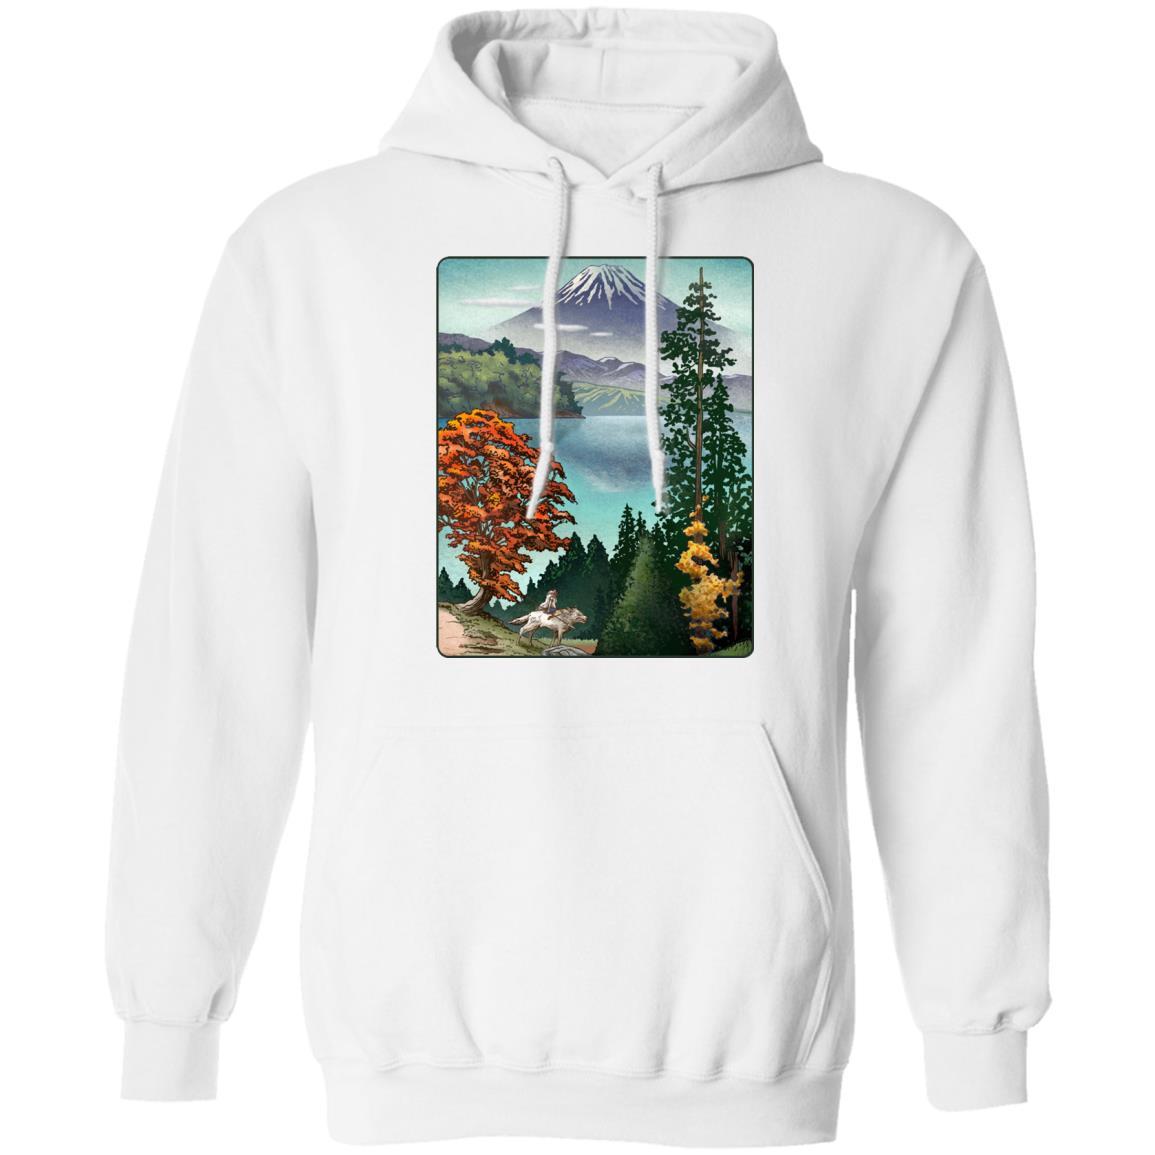 Princess Mononoke Landscape Hoodie